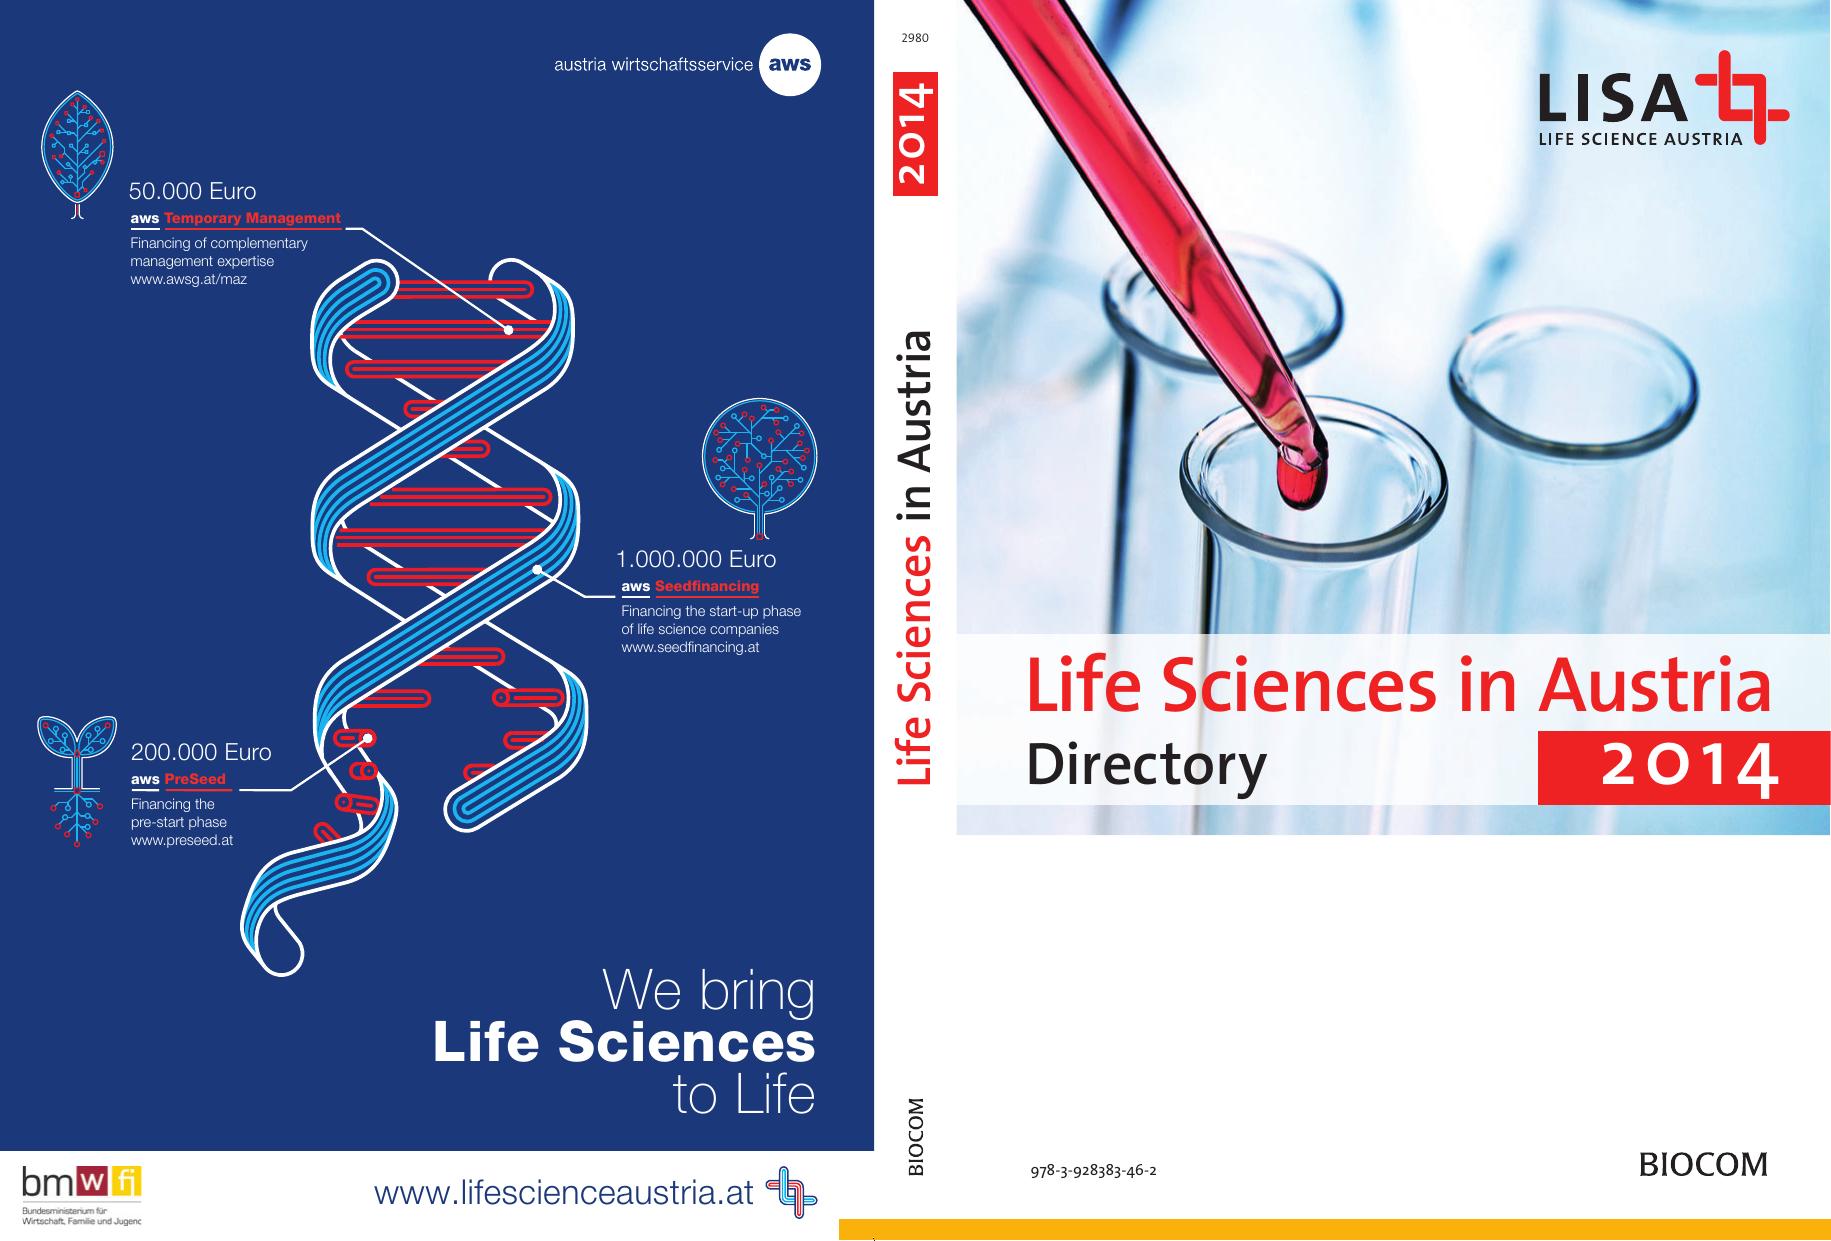 life sciences in austria 2014 austrian life sciences directory